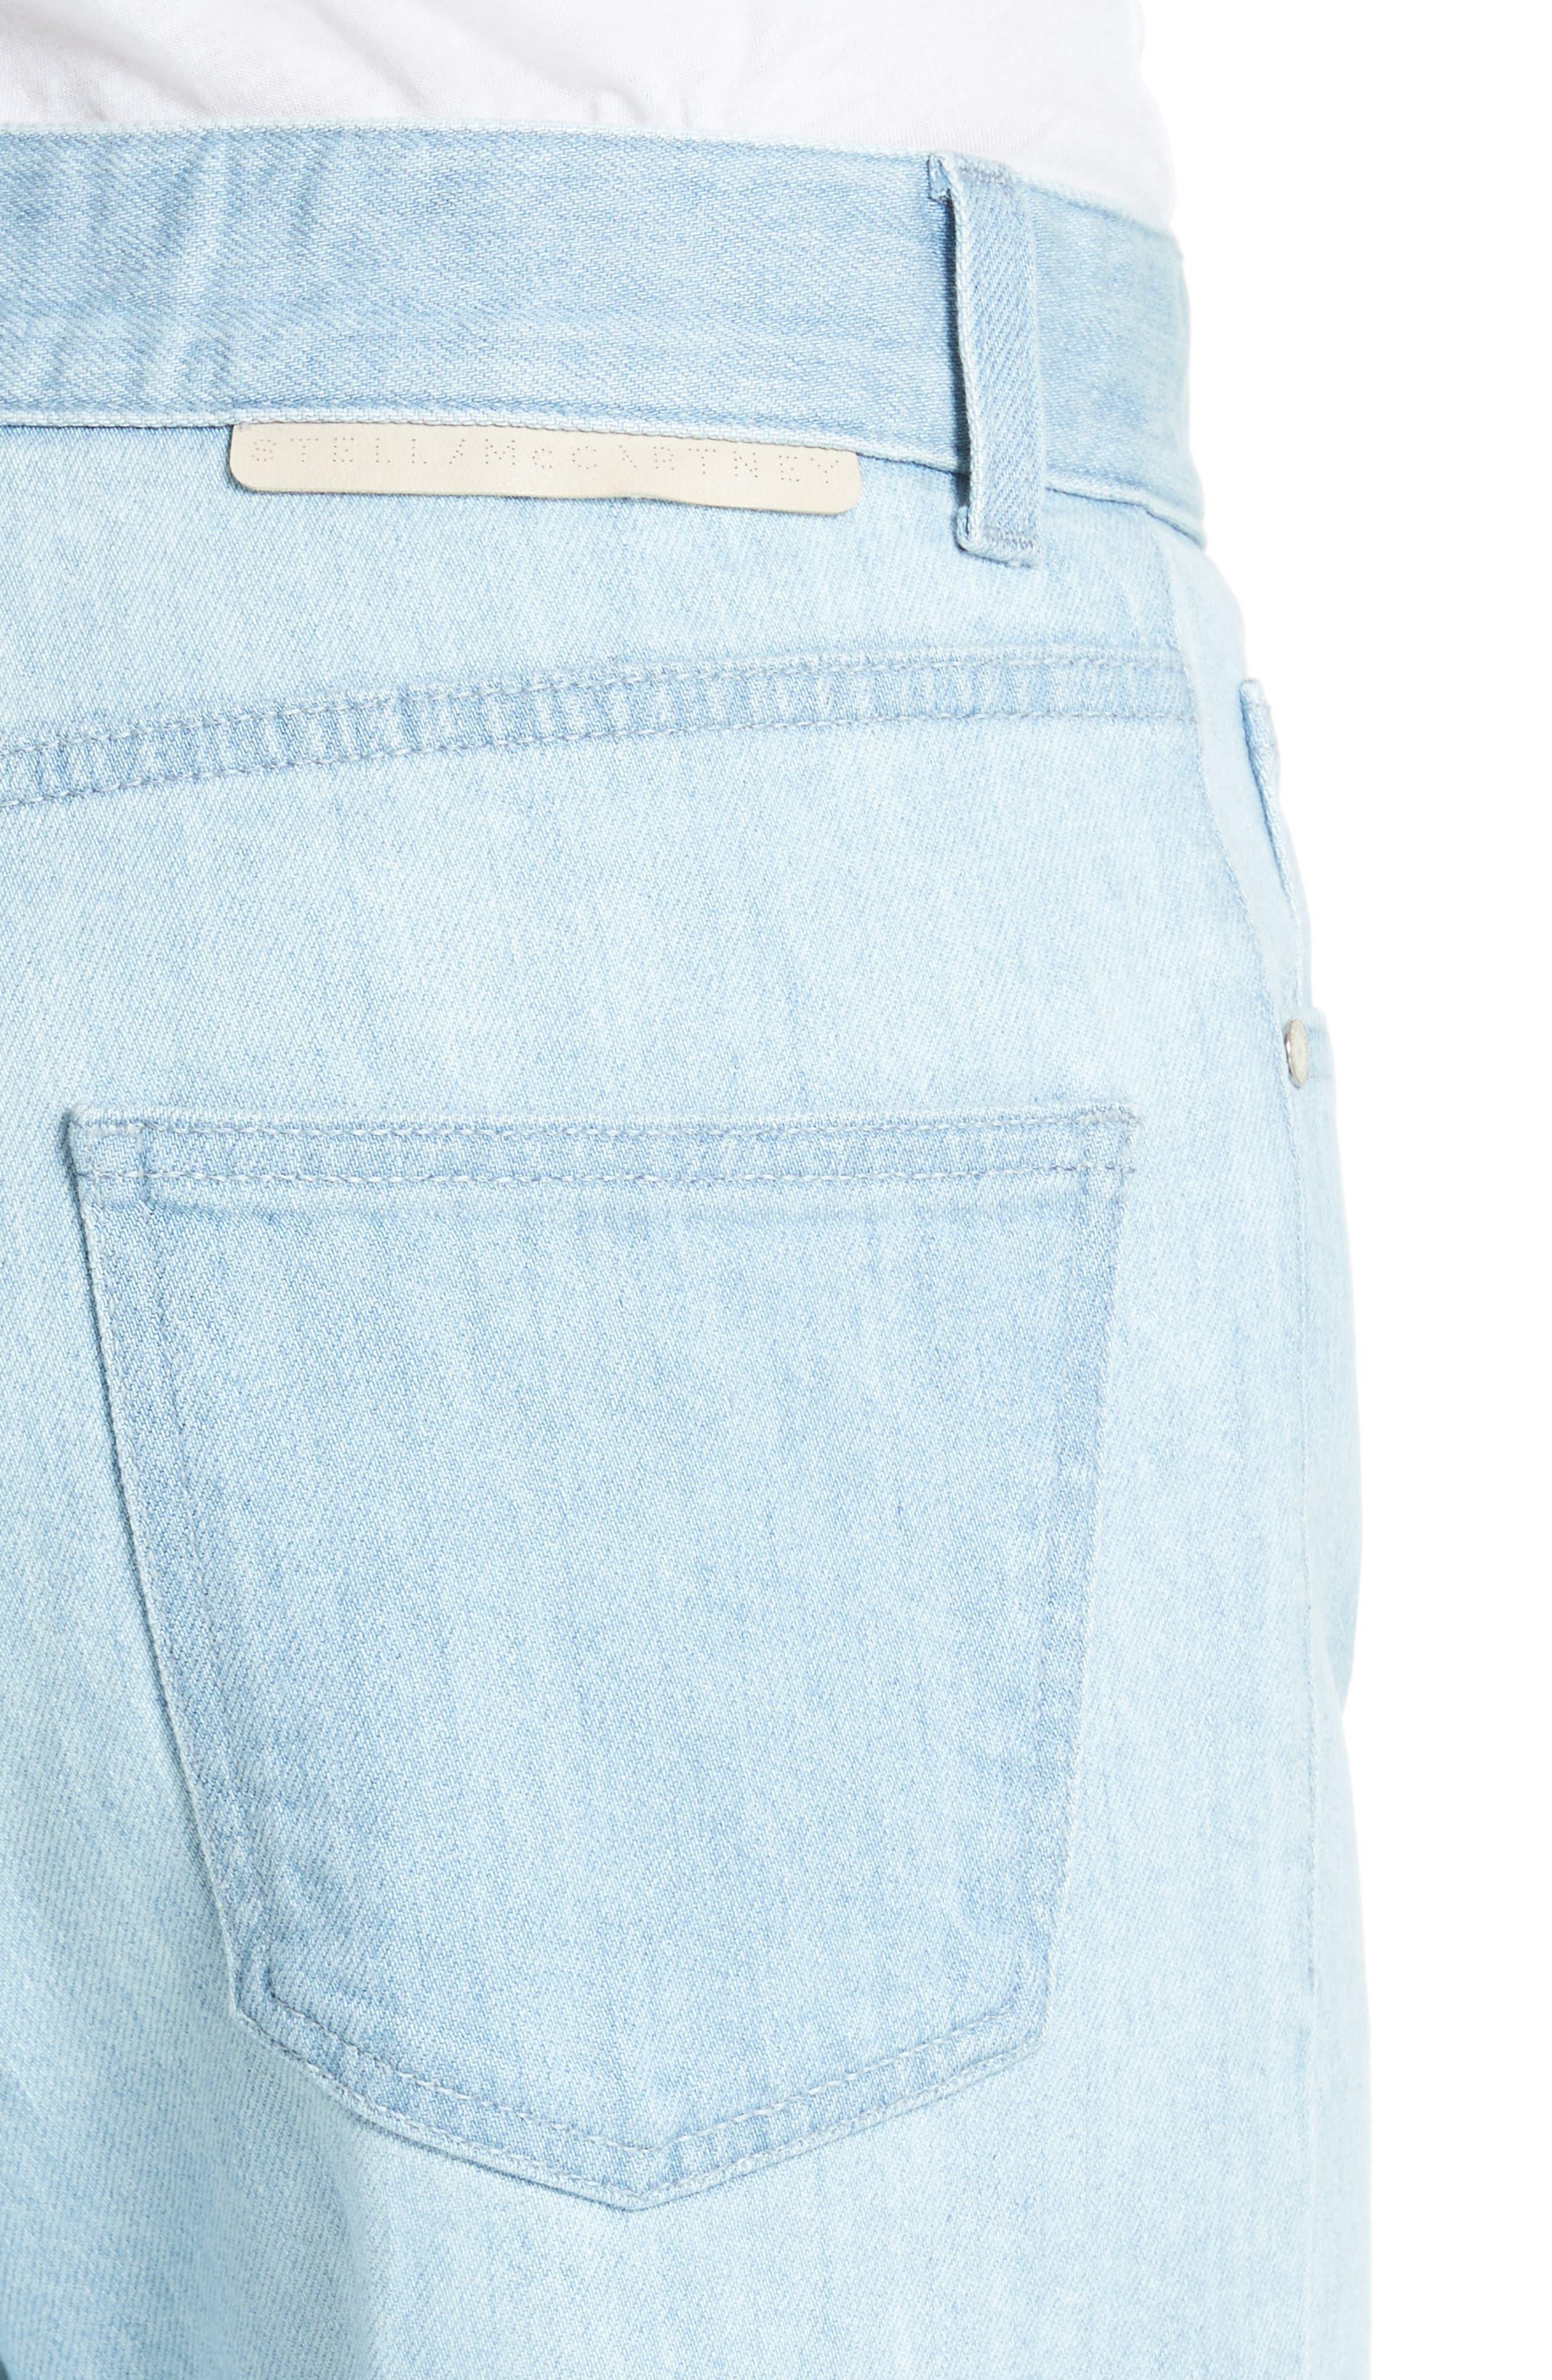 Tie Dye Boyfriend Jeans,                             Alternate thumbnail 5, color,                             Light Blue